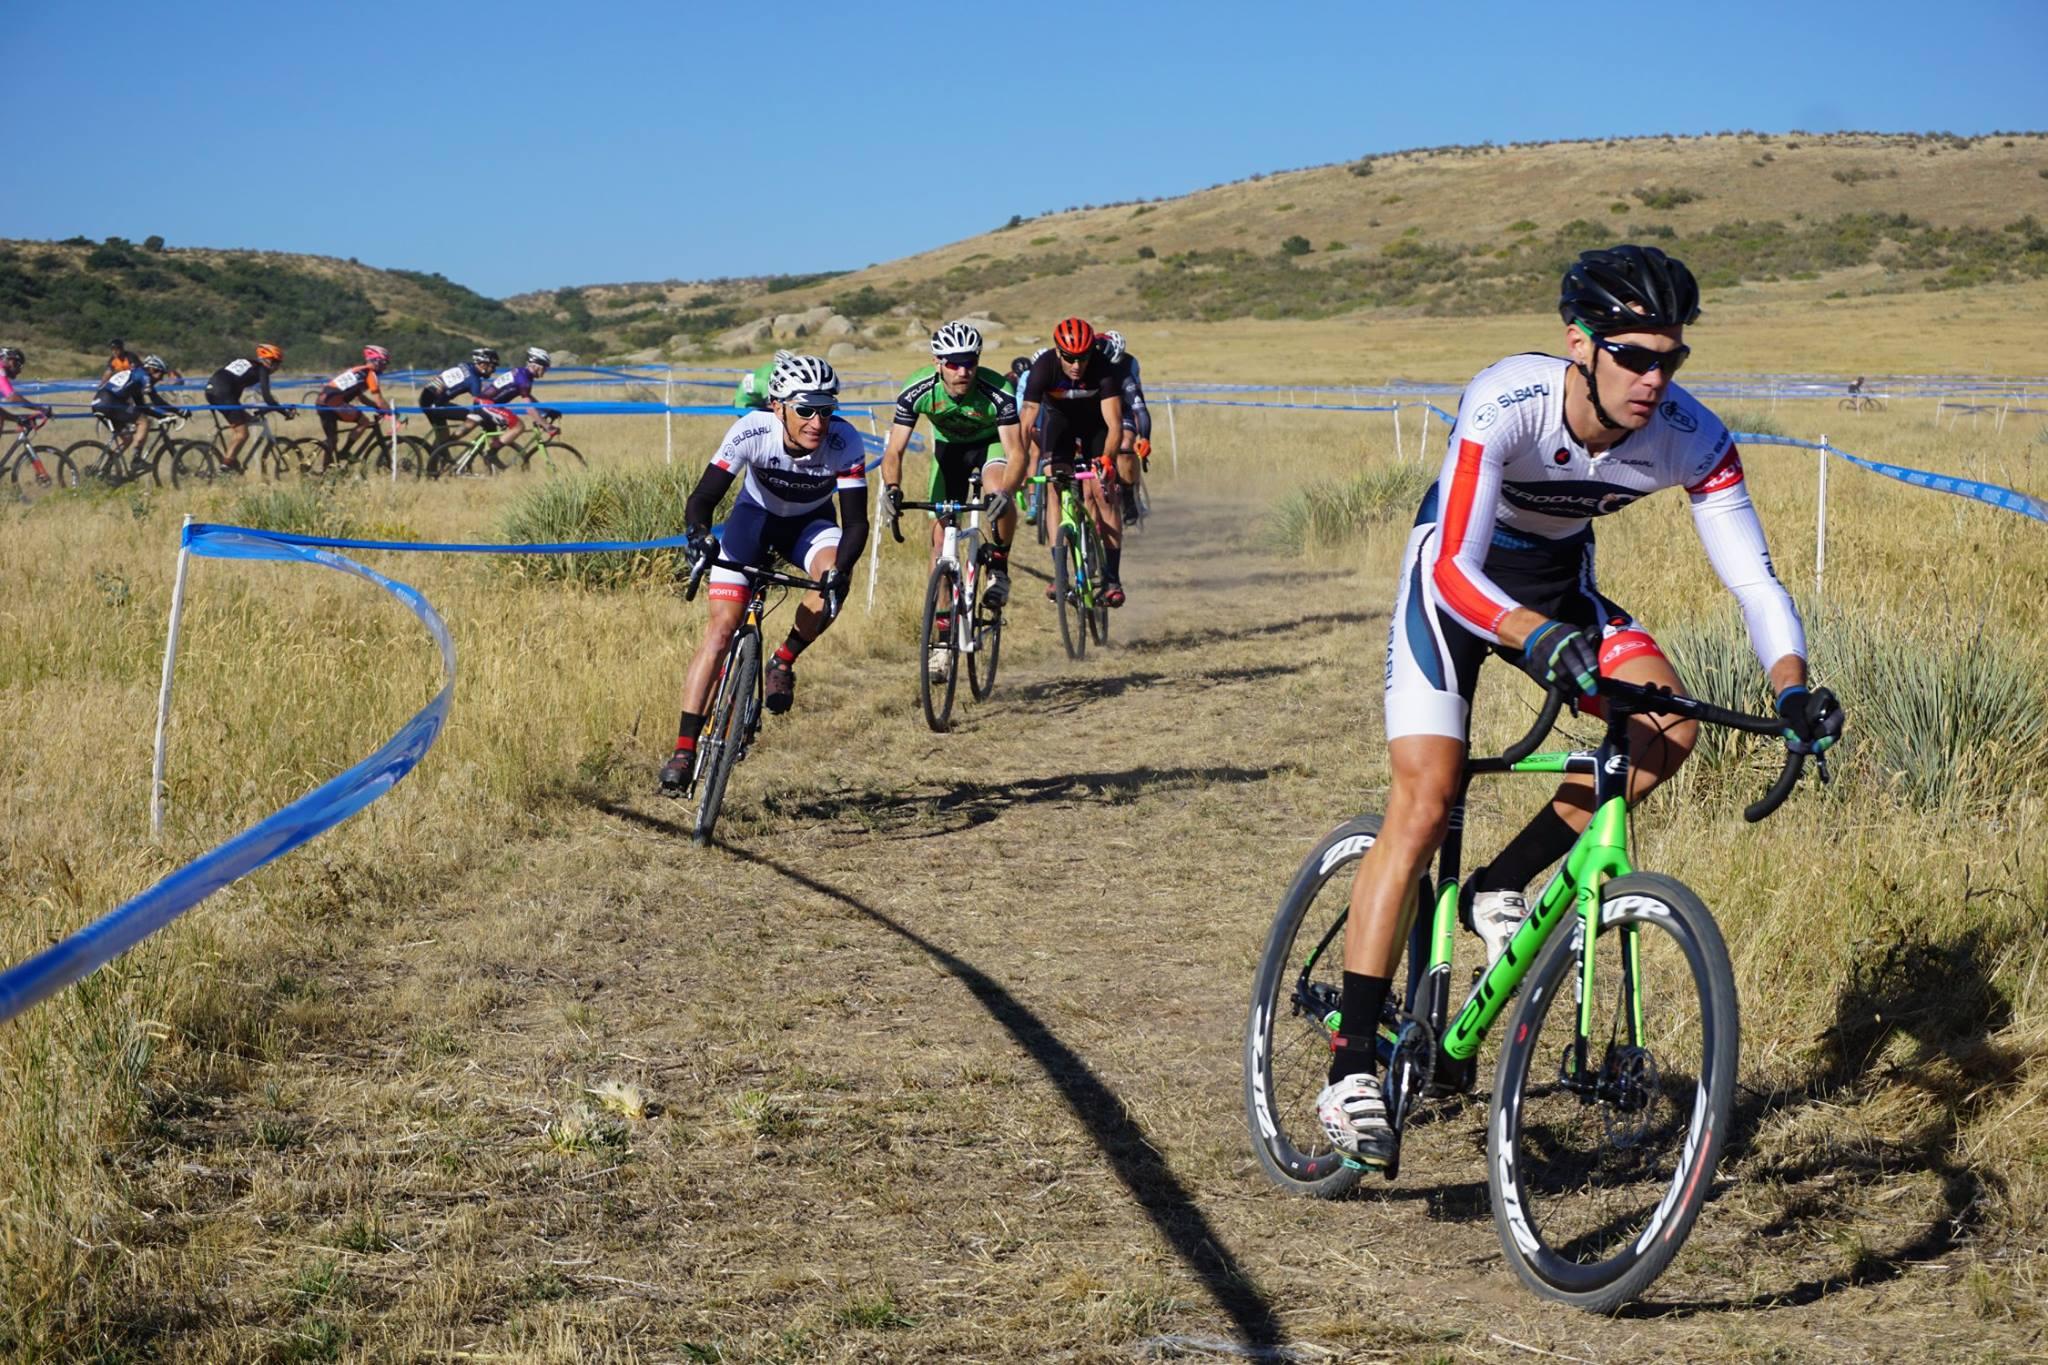 09102016 Cyclo X Rueter Hess Photo2.jpg